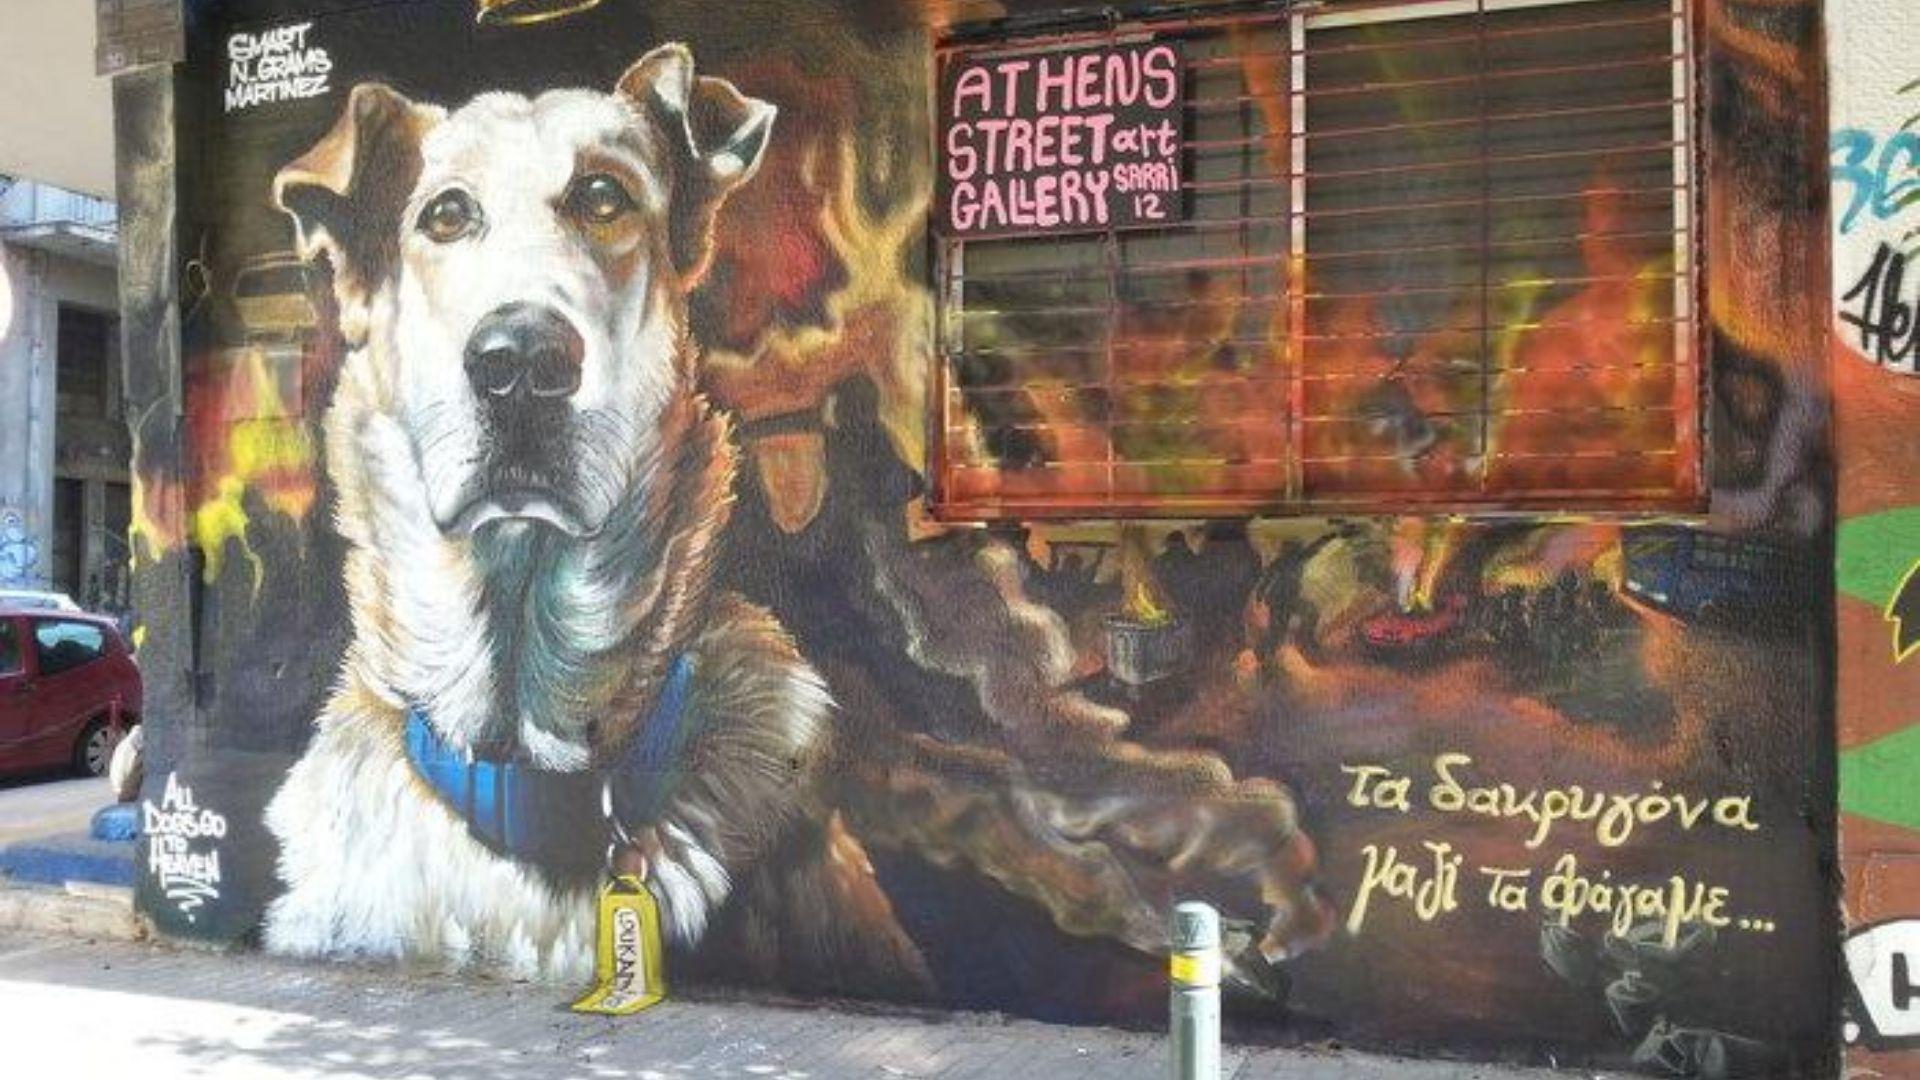 Tours in Athens - Street Art